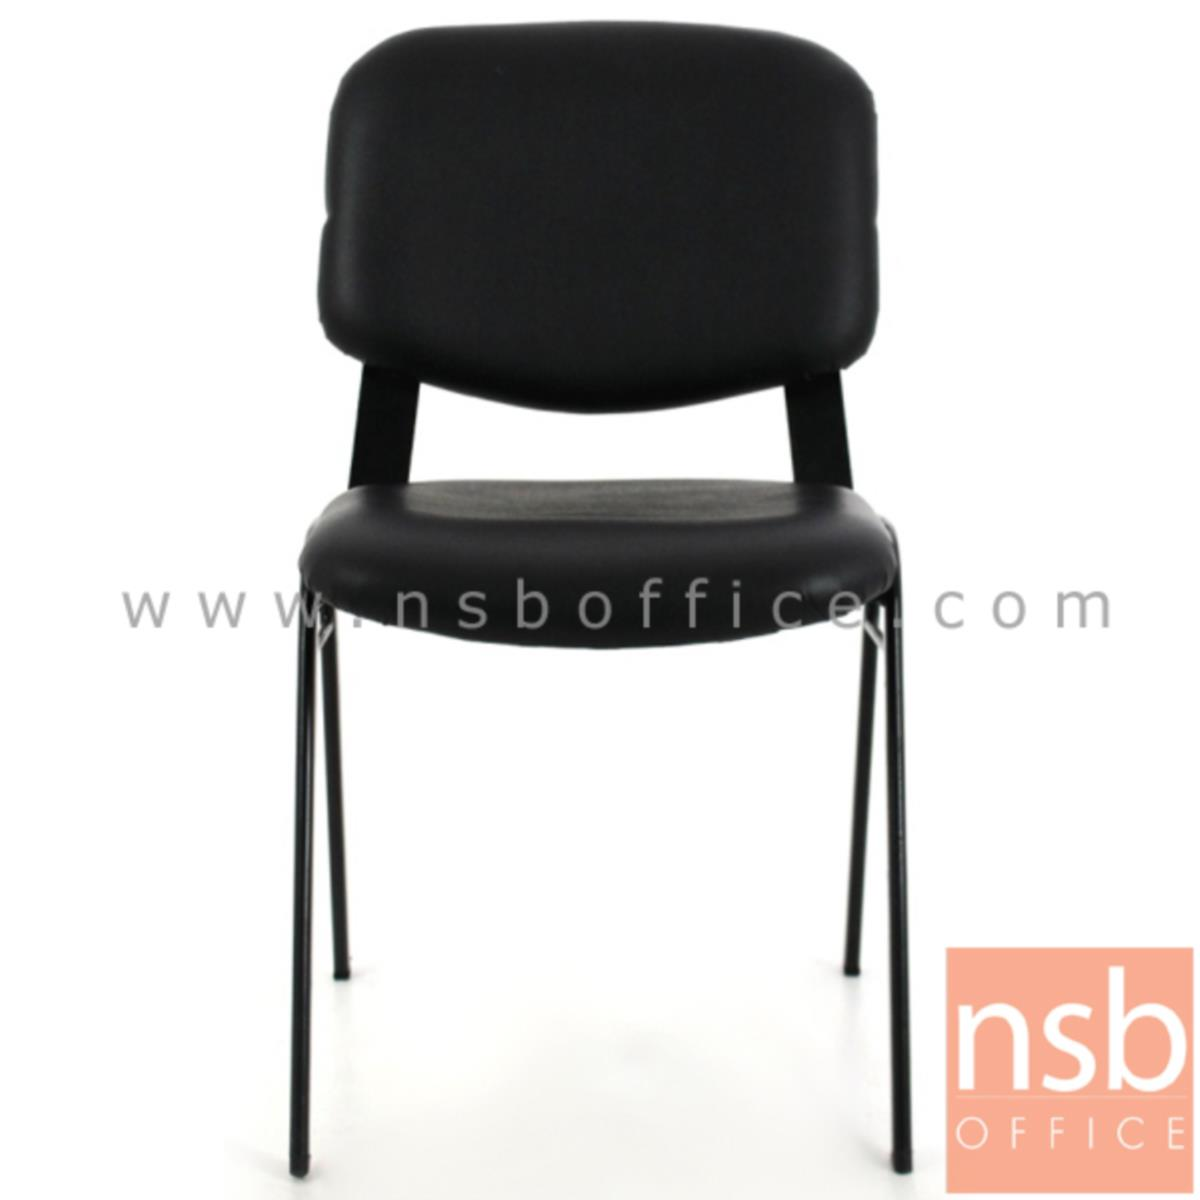 B05A044:เก้าอี้อเนกประสงค์  รุ่น Harding (ฮาร์ดิง)  ขาเหล็กพ่นดำ